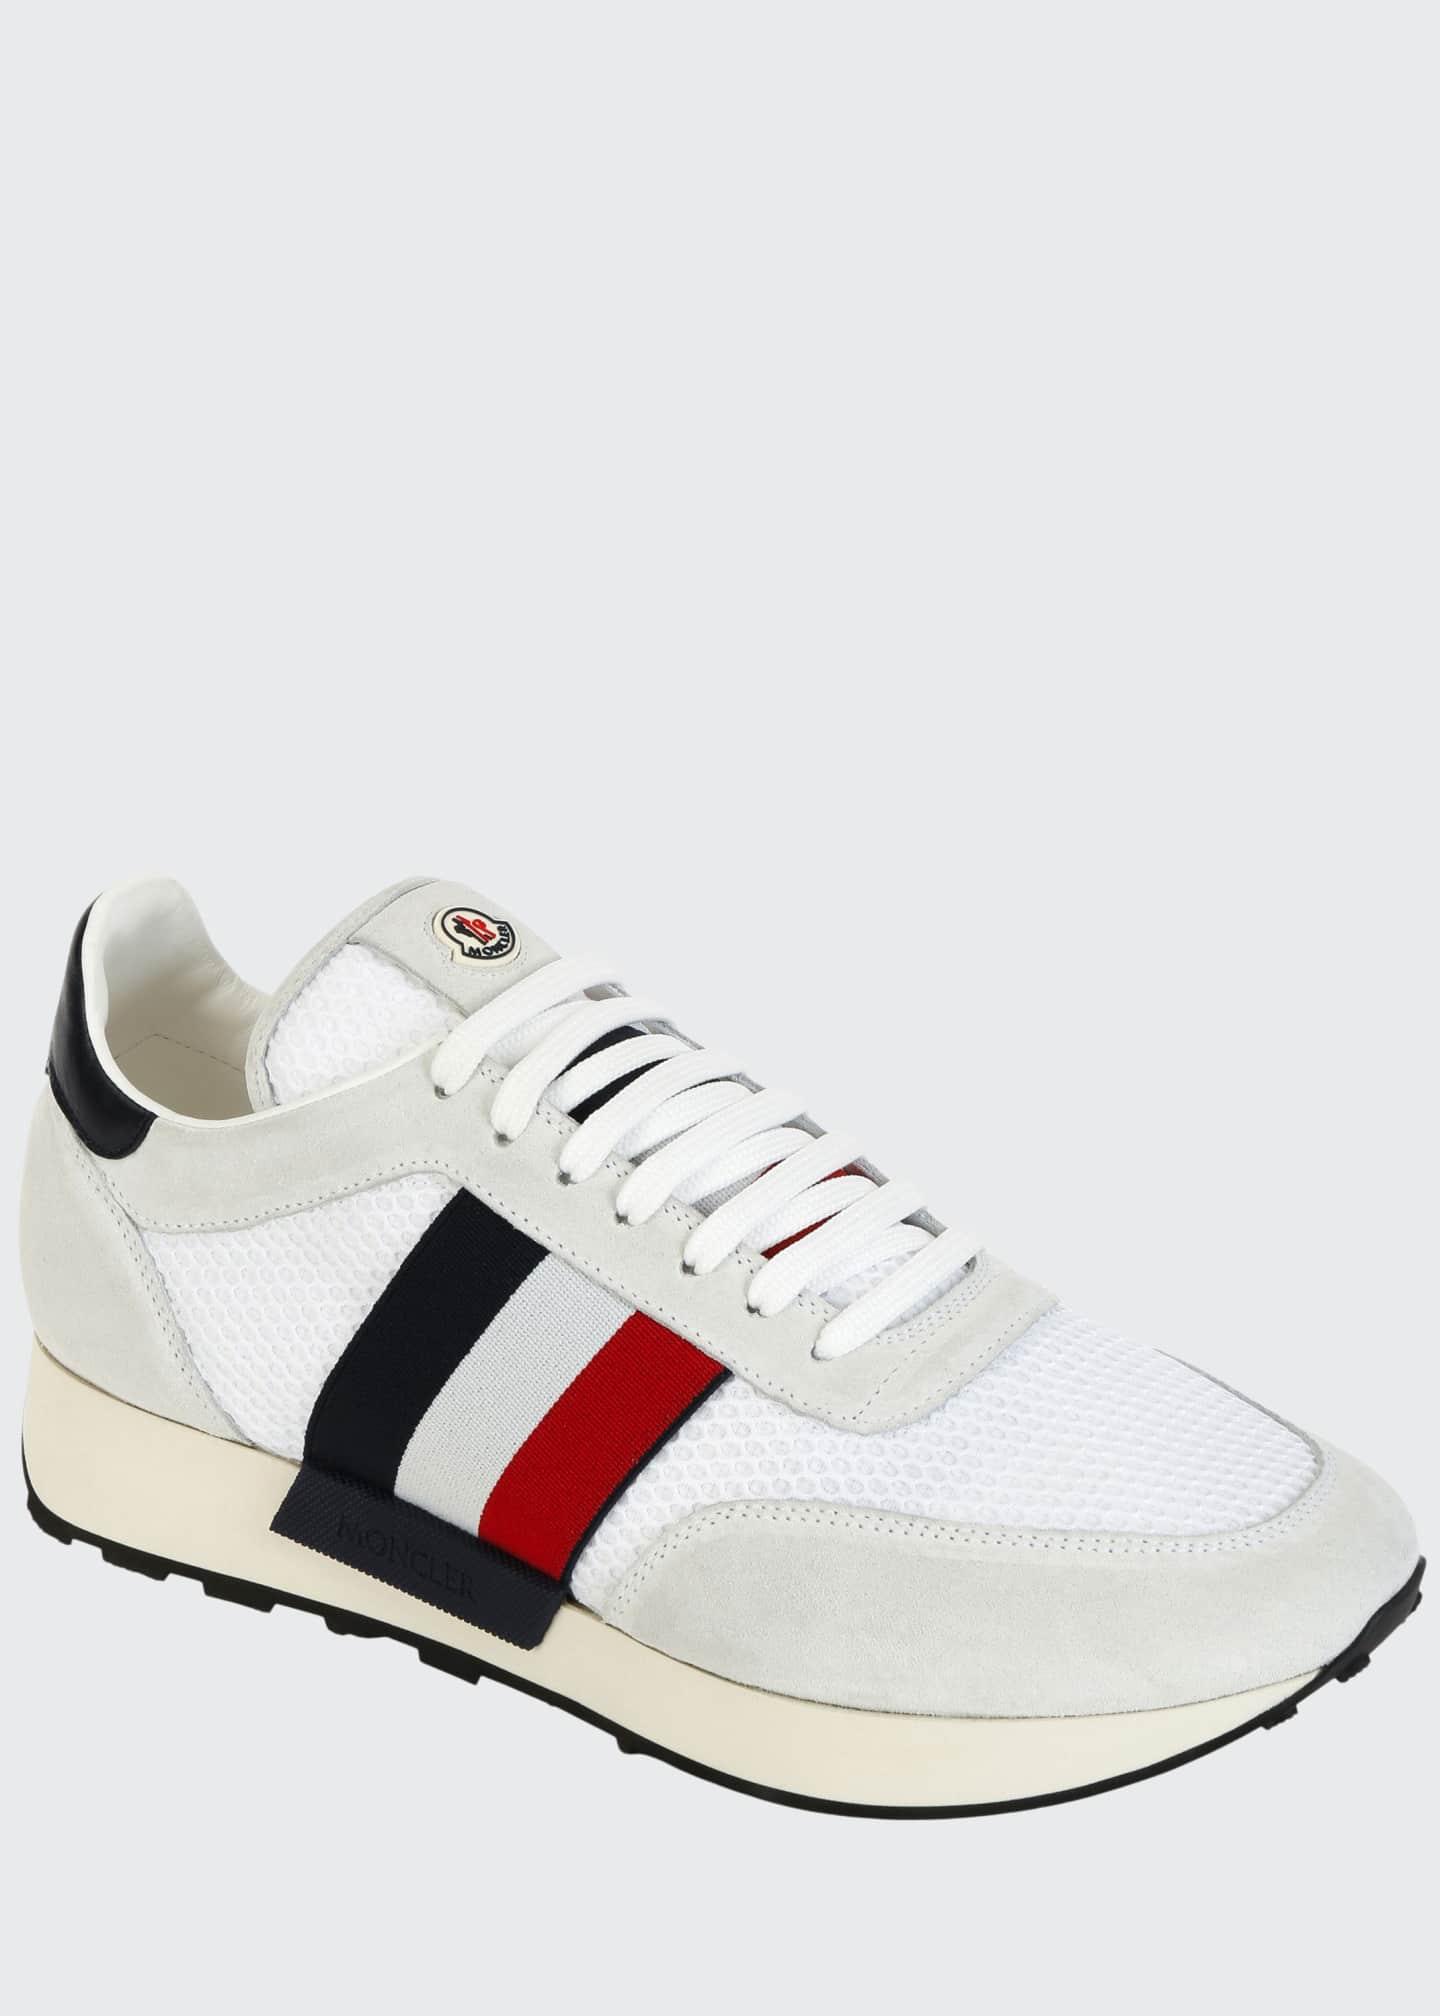 Moncler Men's Horace Suede & Nylon Trainer Sneakers